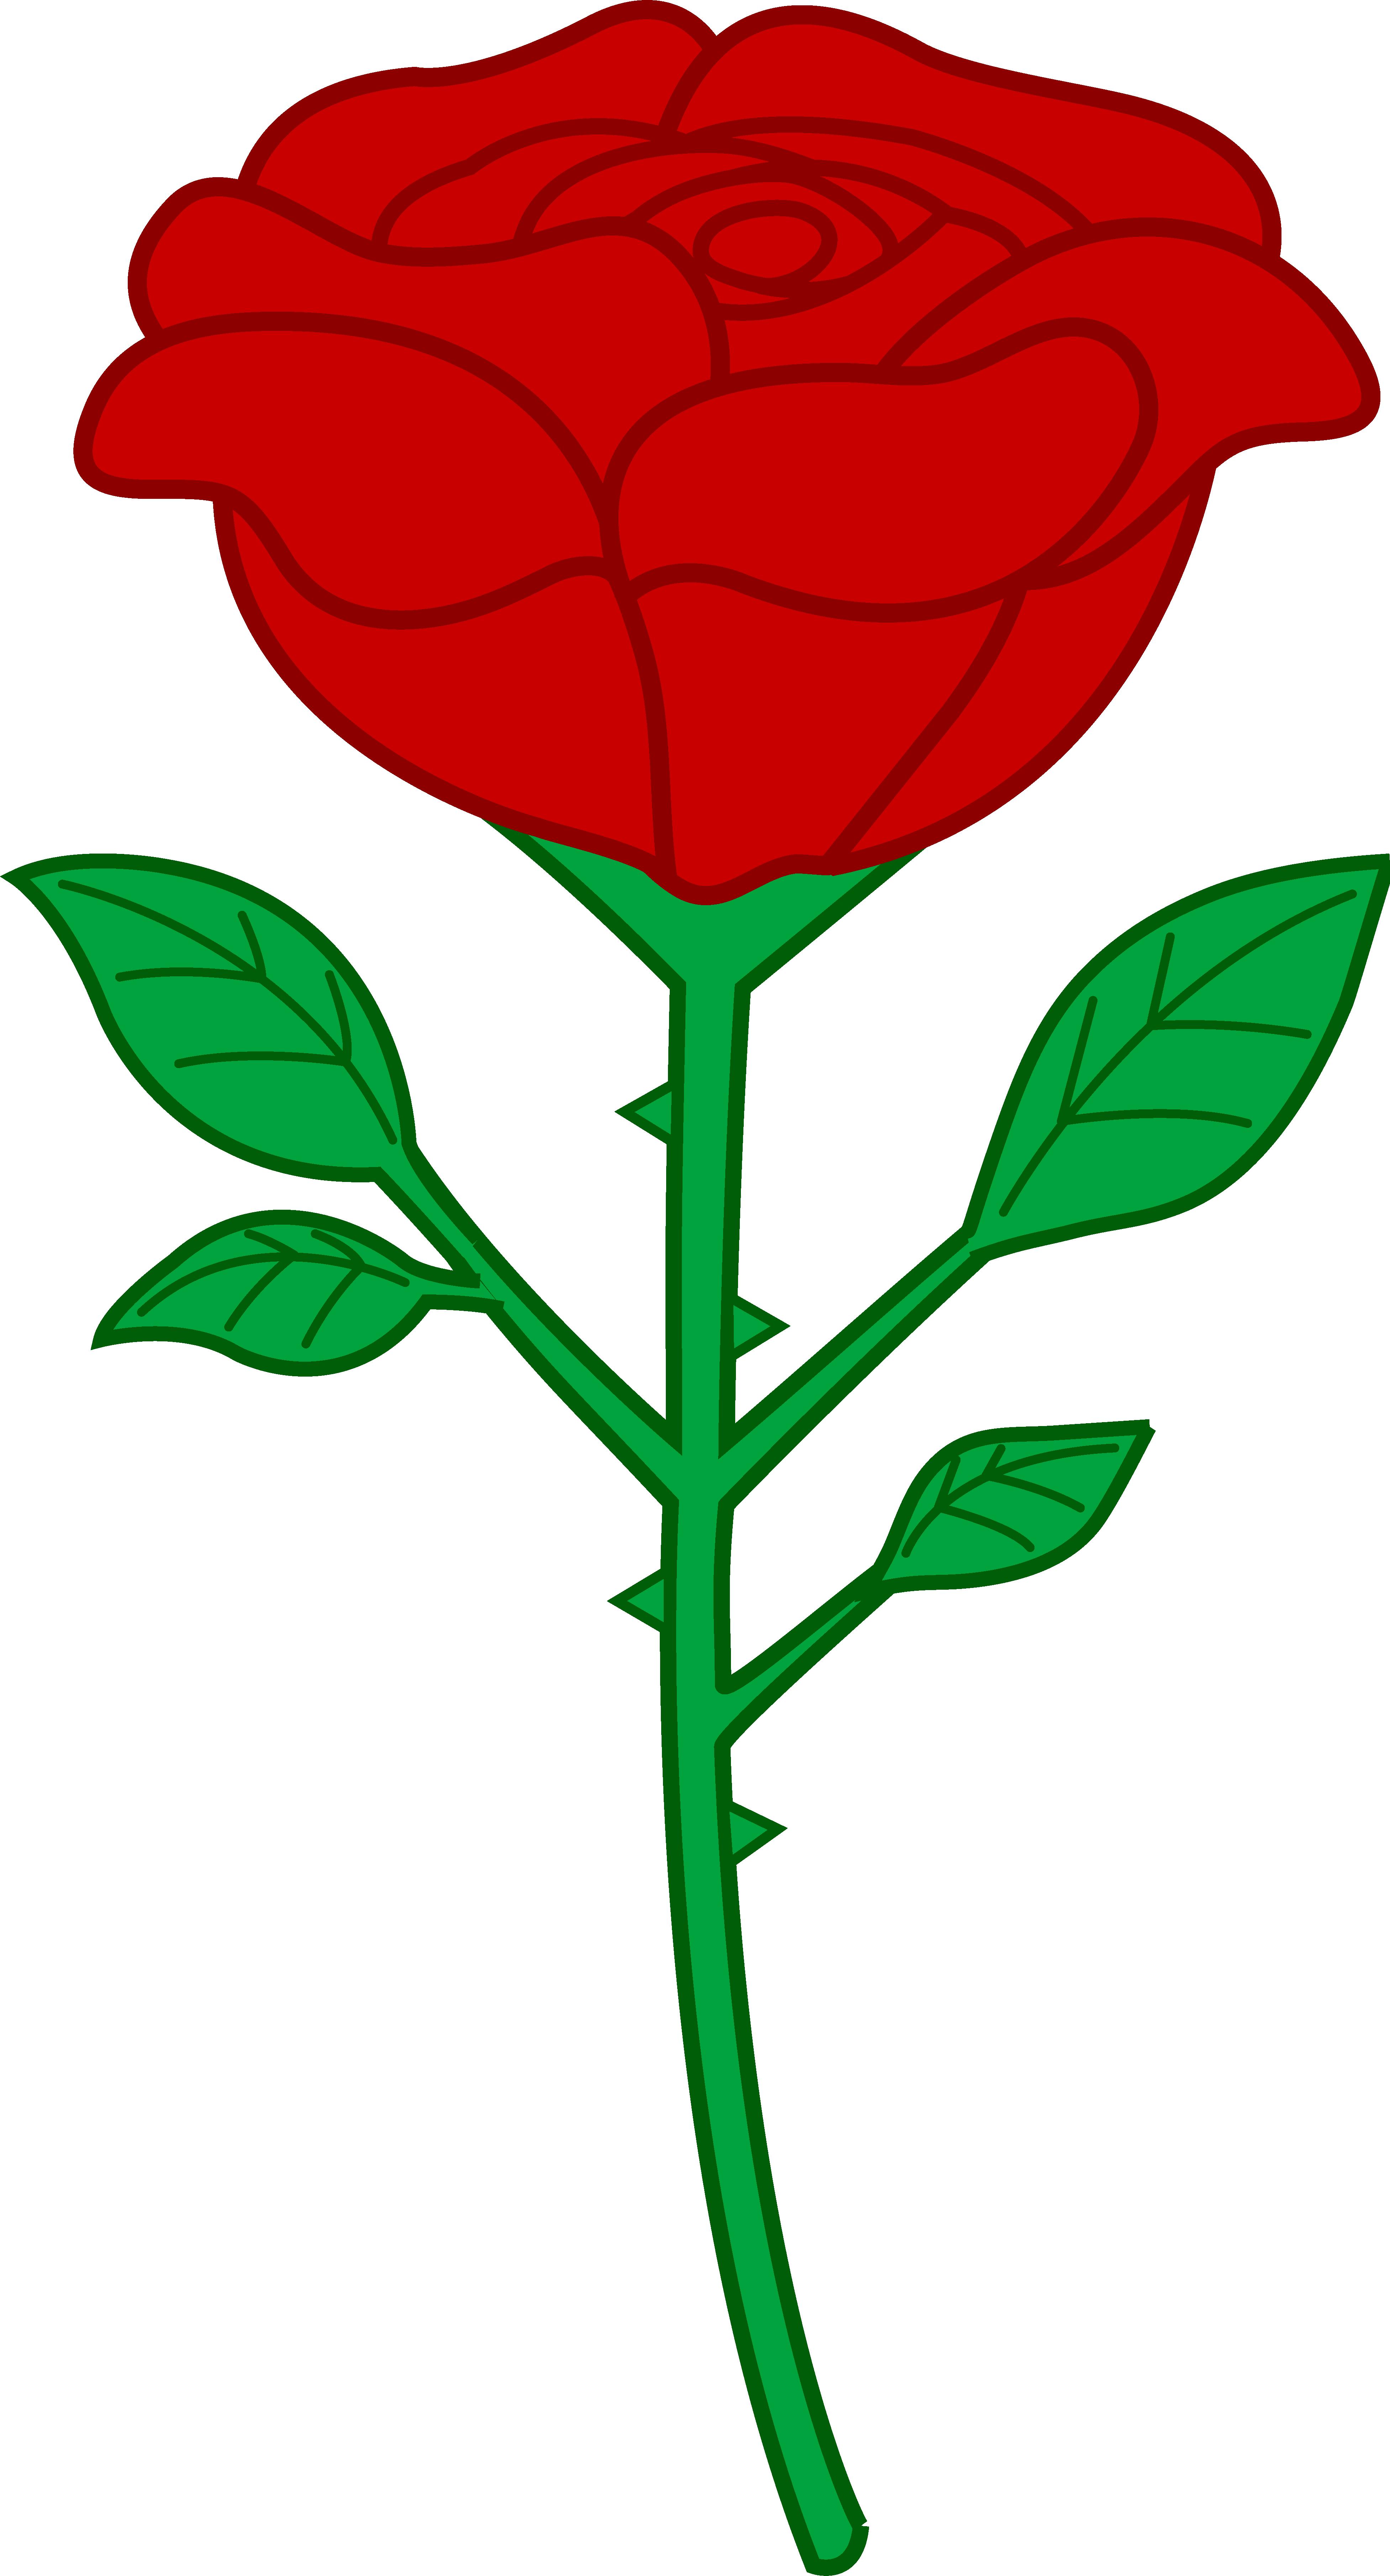 Single Red Rose Clip Art - Free Clip Art